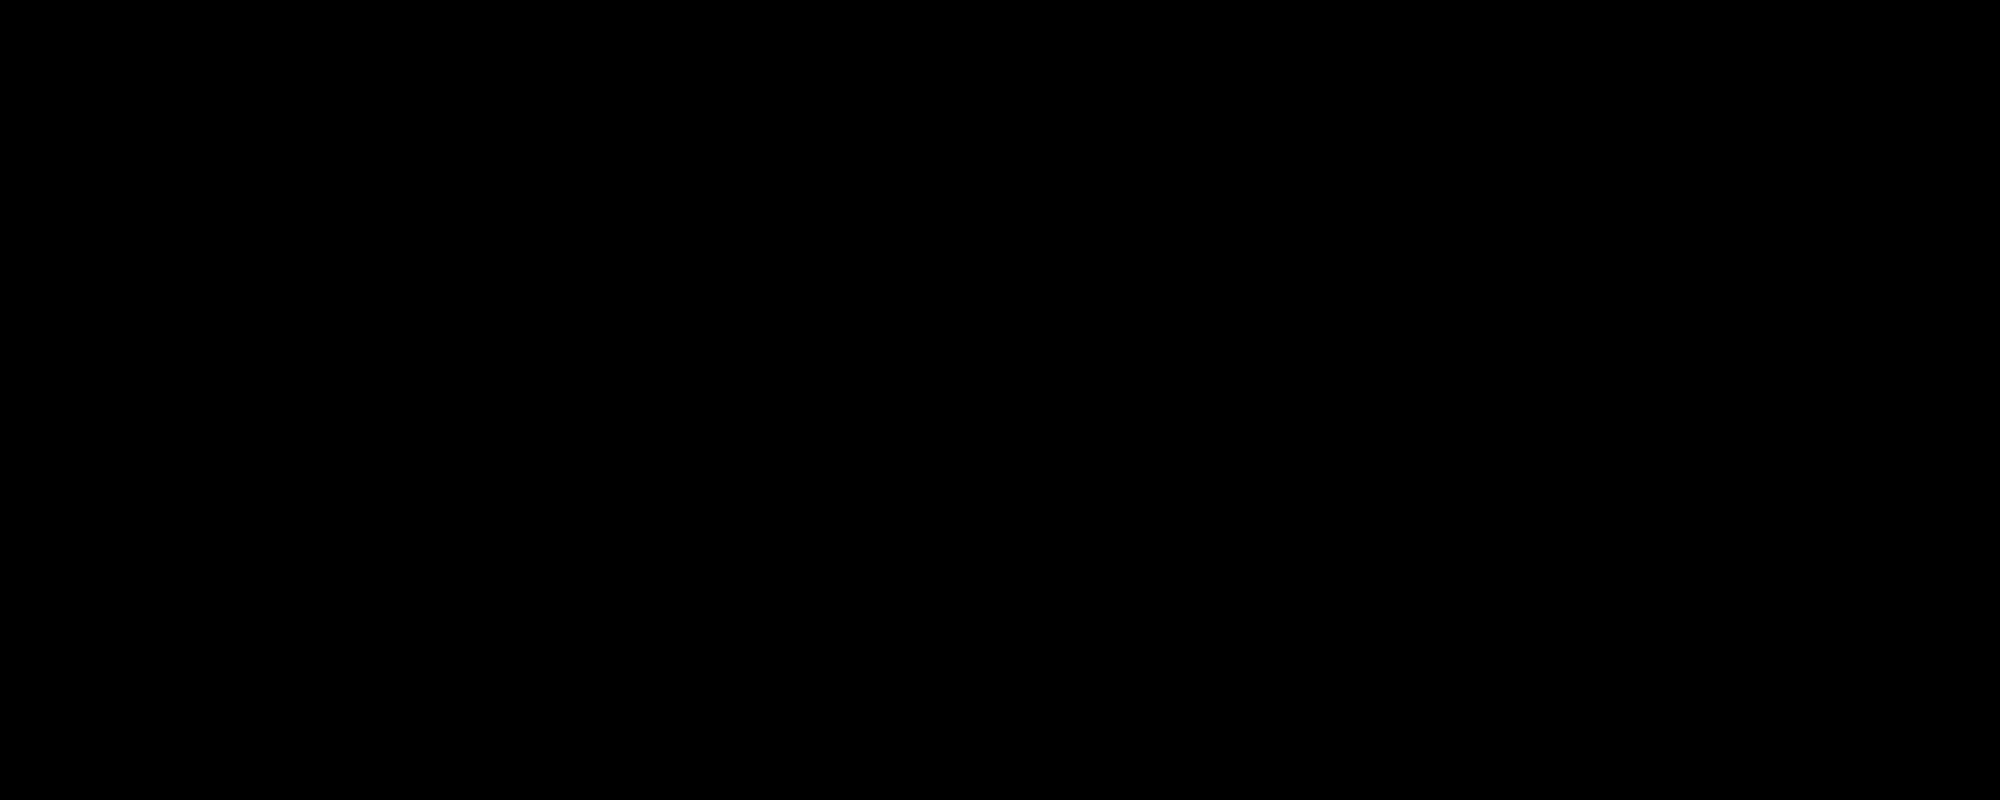 EQUIP IGNITE IMPACT-logo-black.png